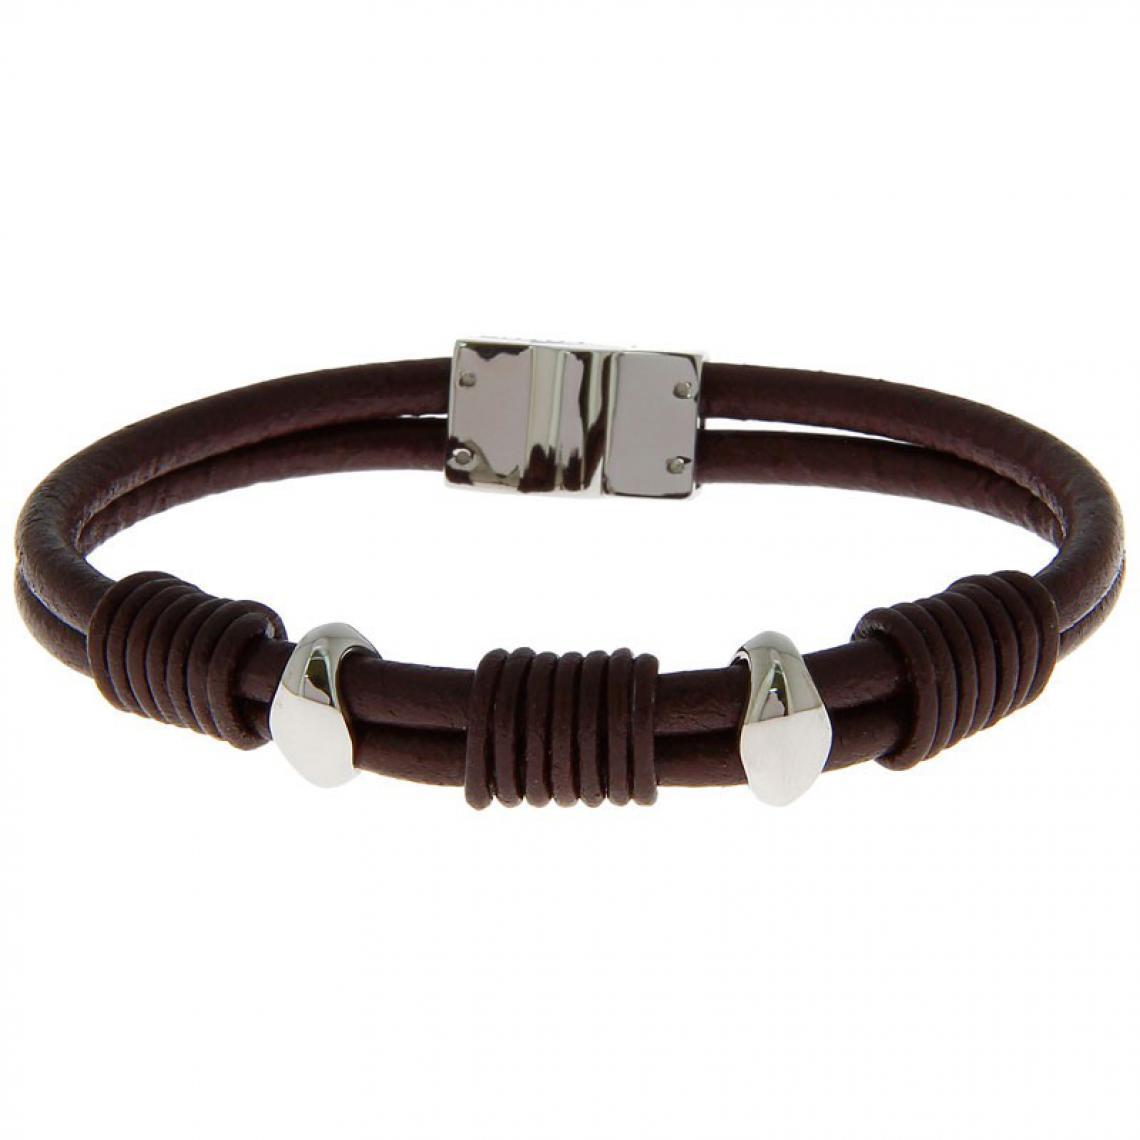 Bracelet Lotus LS1389-2-1 - LS1389-2-1 - Modalova